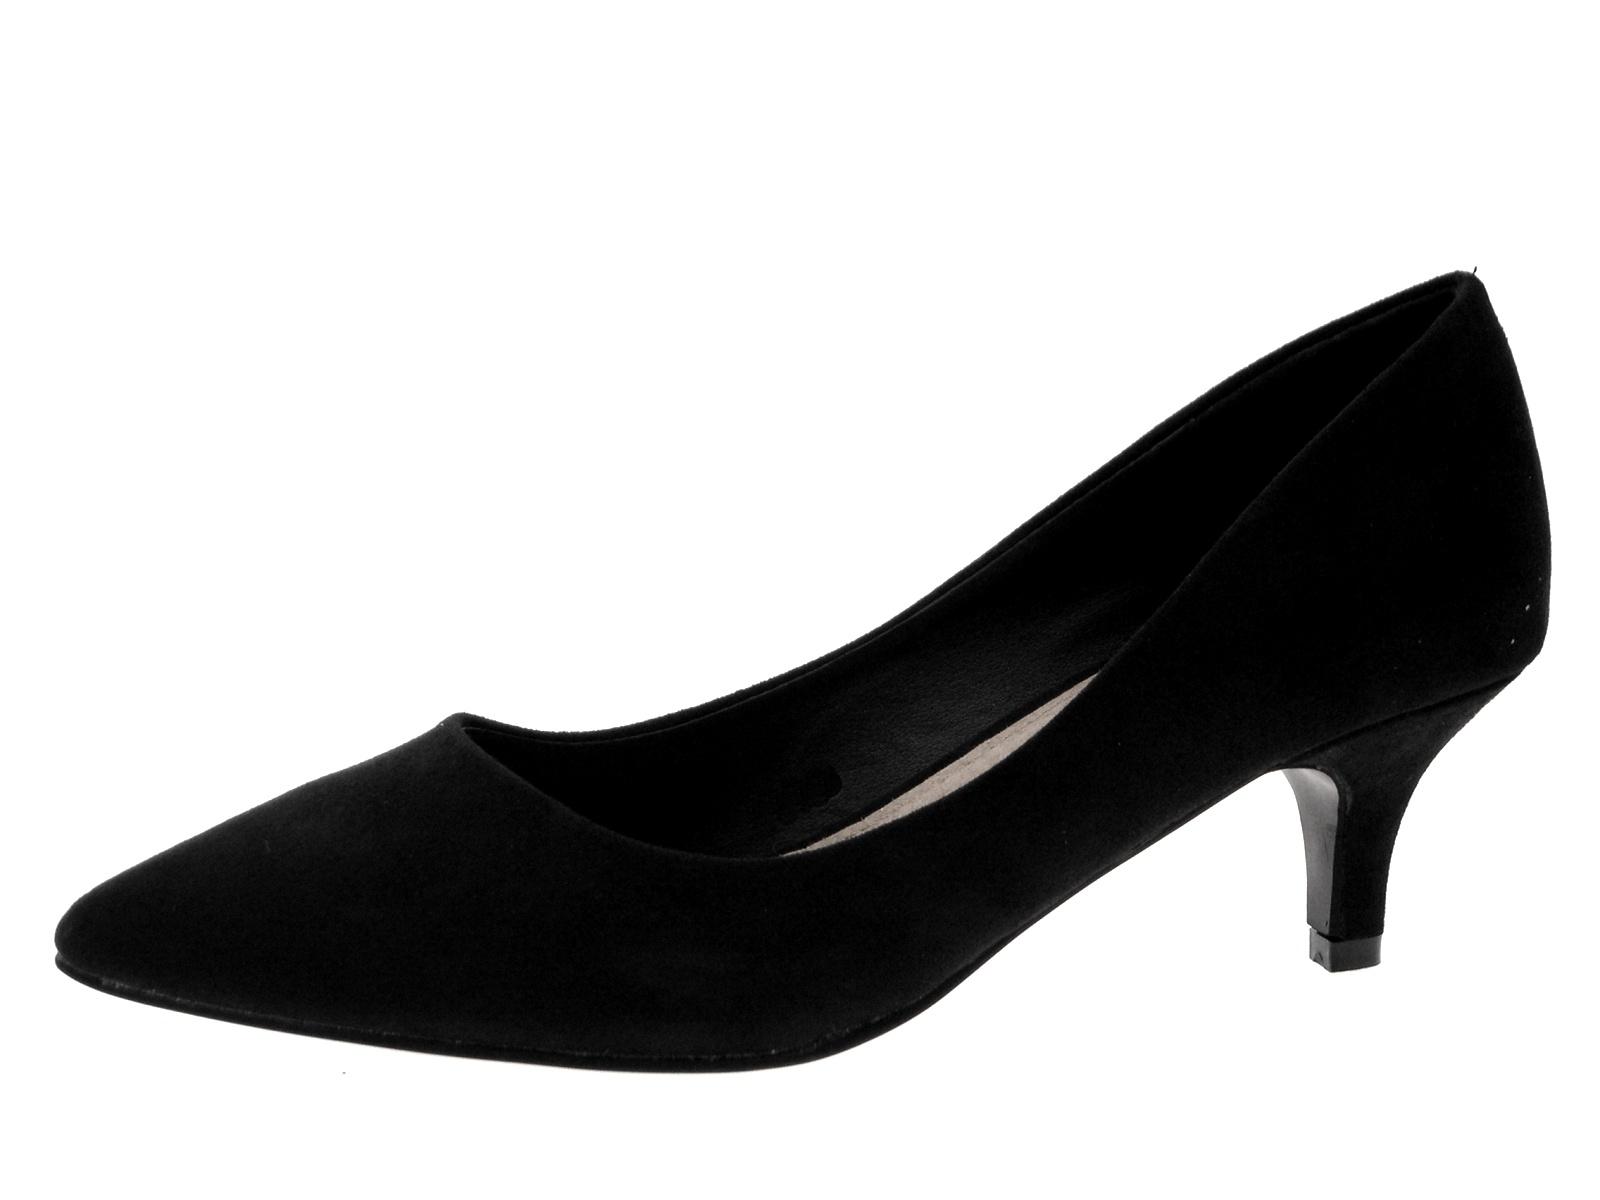 Offic Ladies Burgandy Suede Shoes